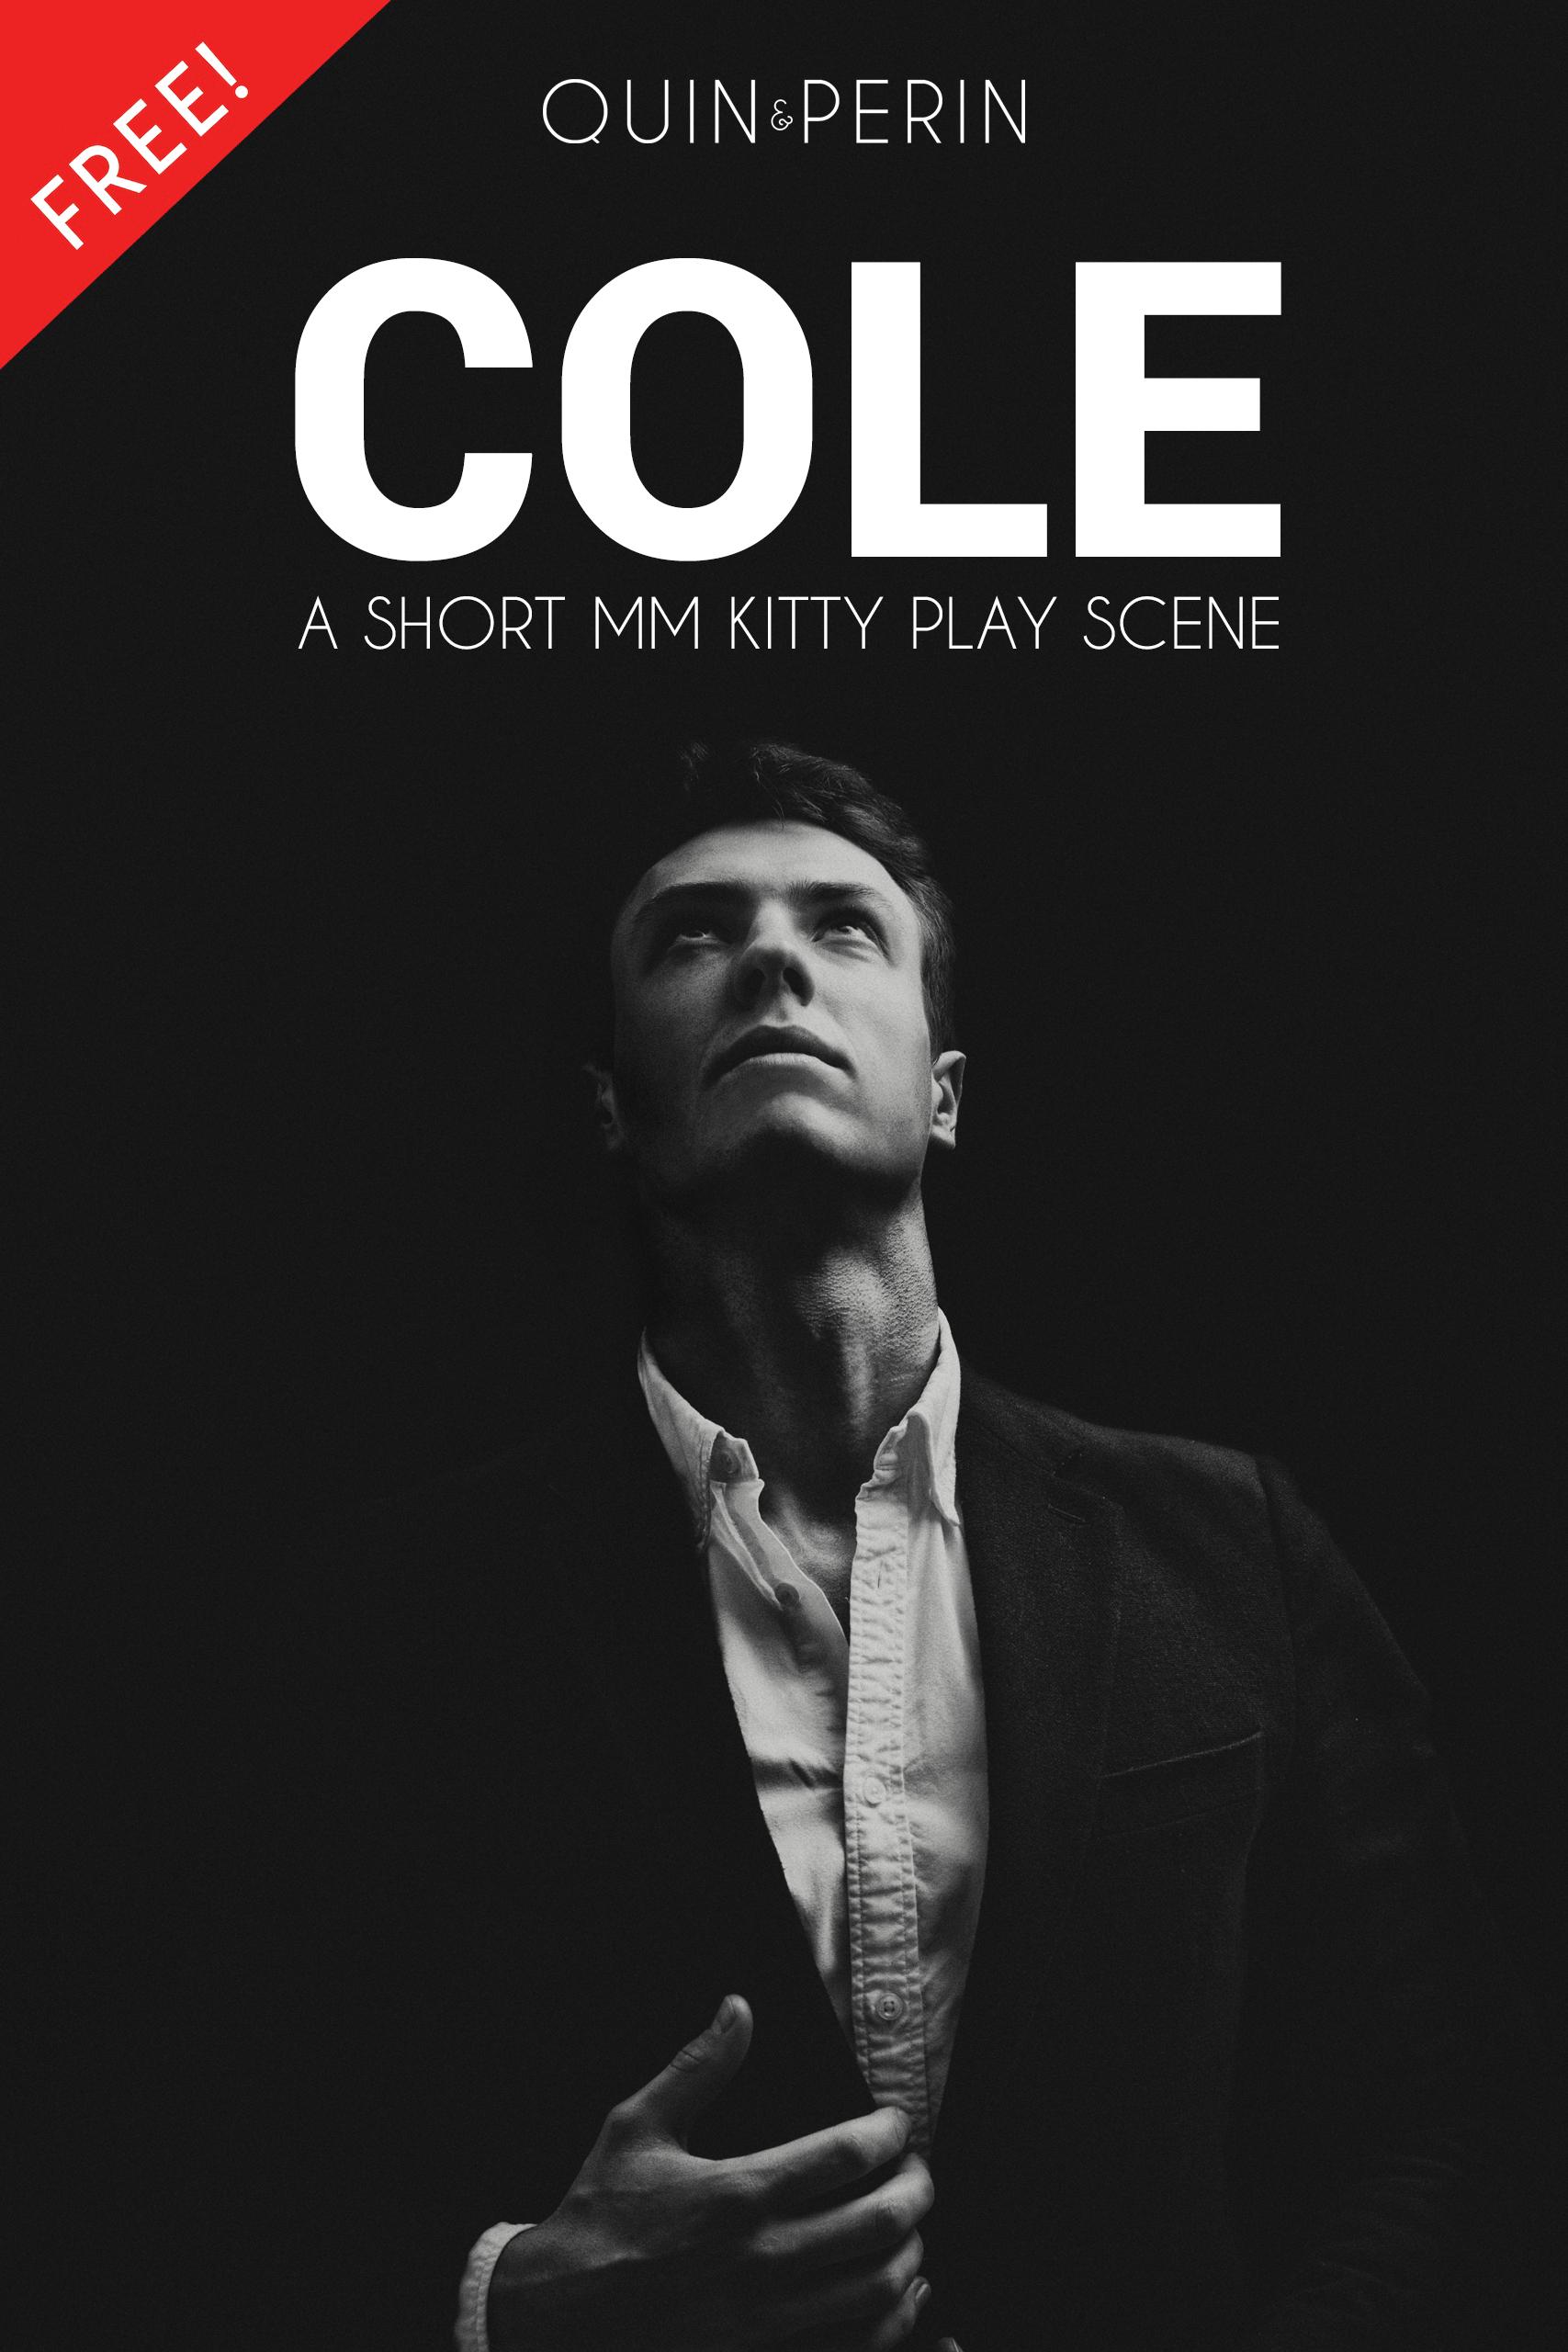 Cole-Generic.jpg